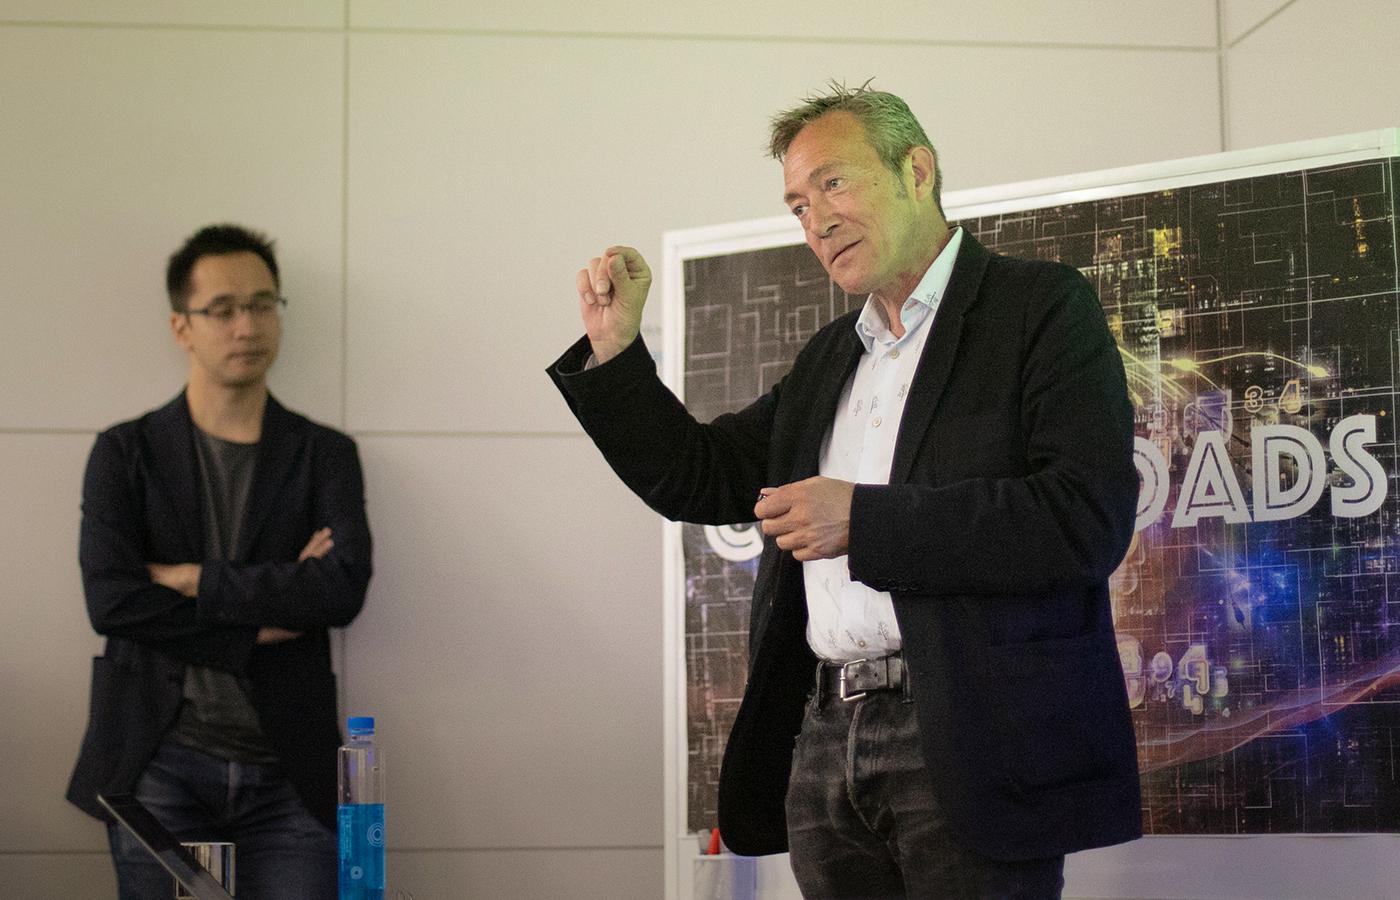 Professor Axel Cleeremans presenting to the Cross Roads audience